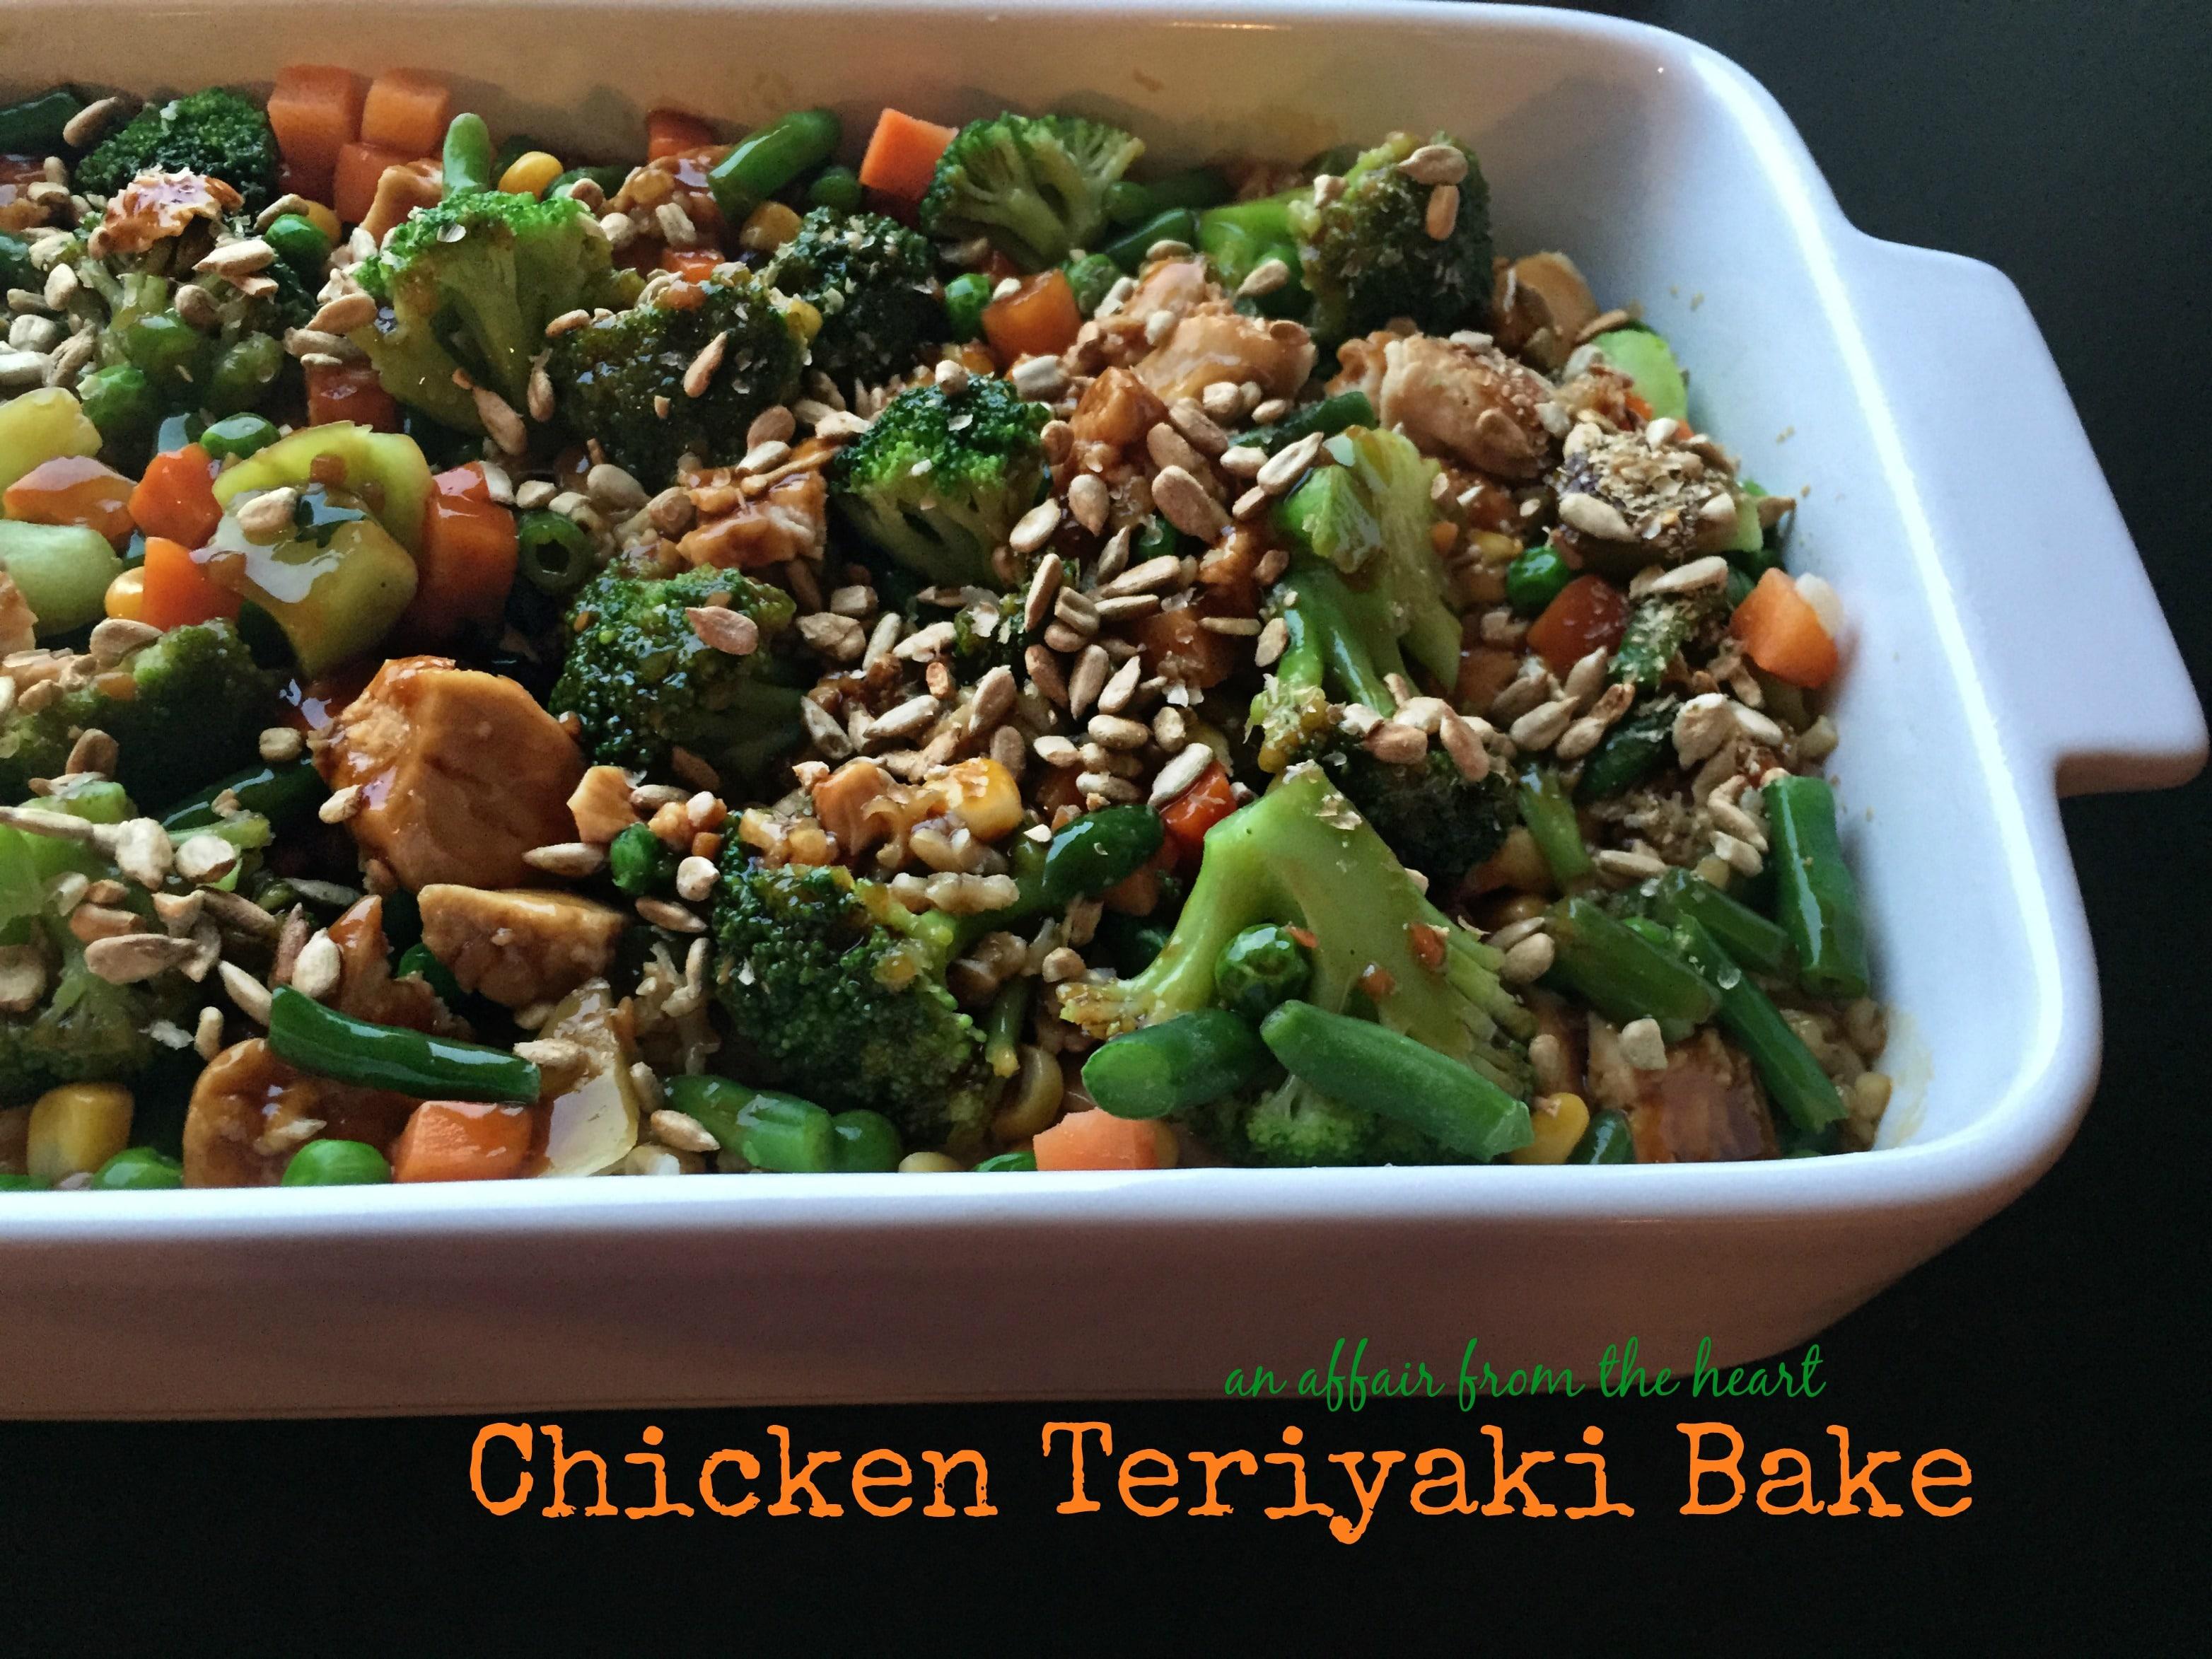 Chicken Teriyaki Bake